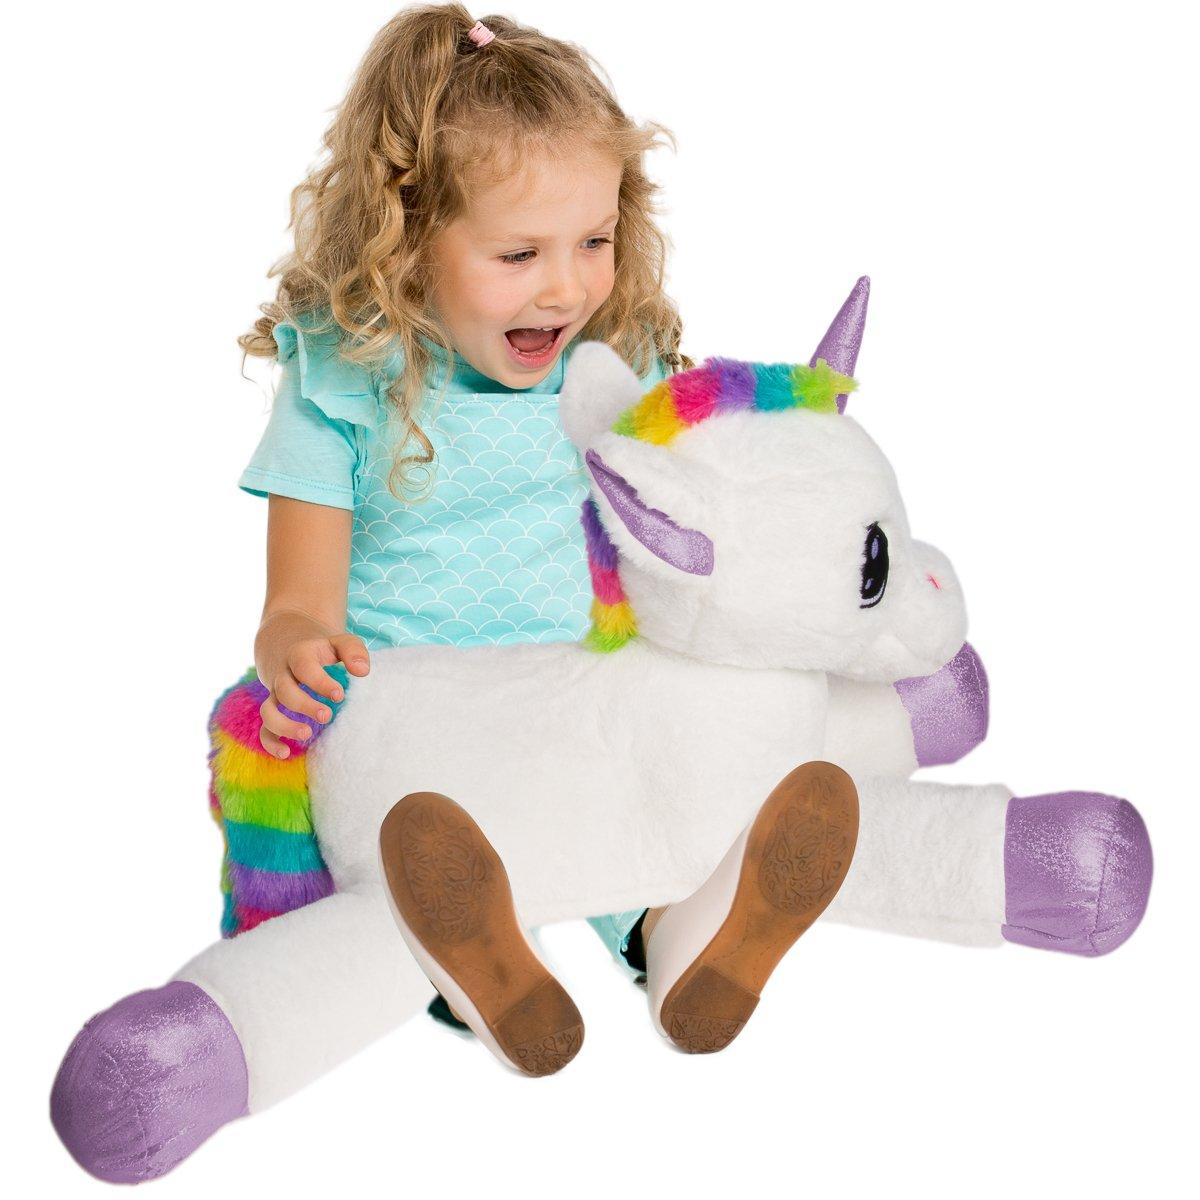 Gitzy 25 Inch Large Rainbow Unicorn Stuffed Animal Girls Kids Toddler Plush Toy Pillow Home Travel